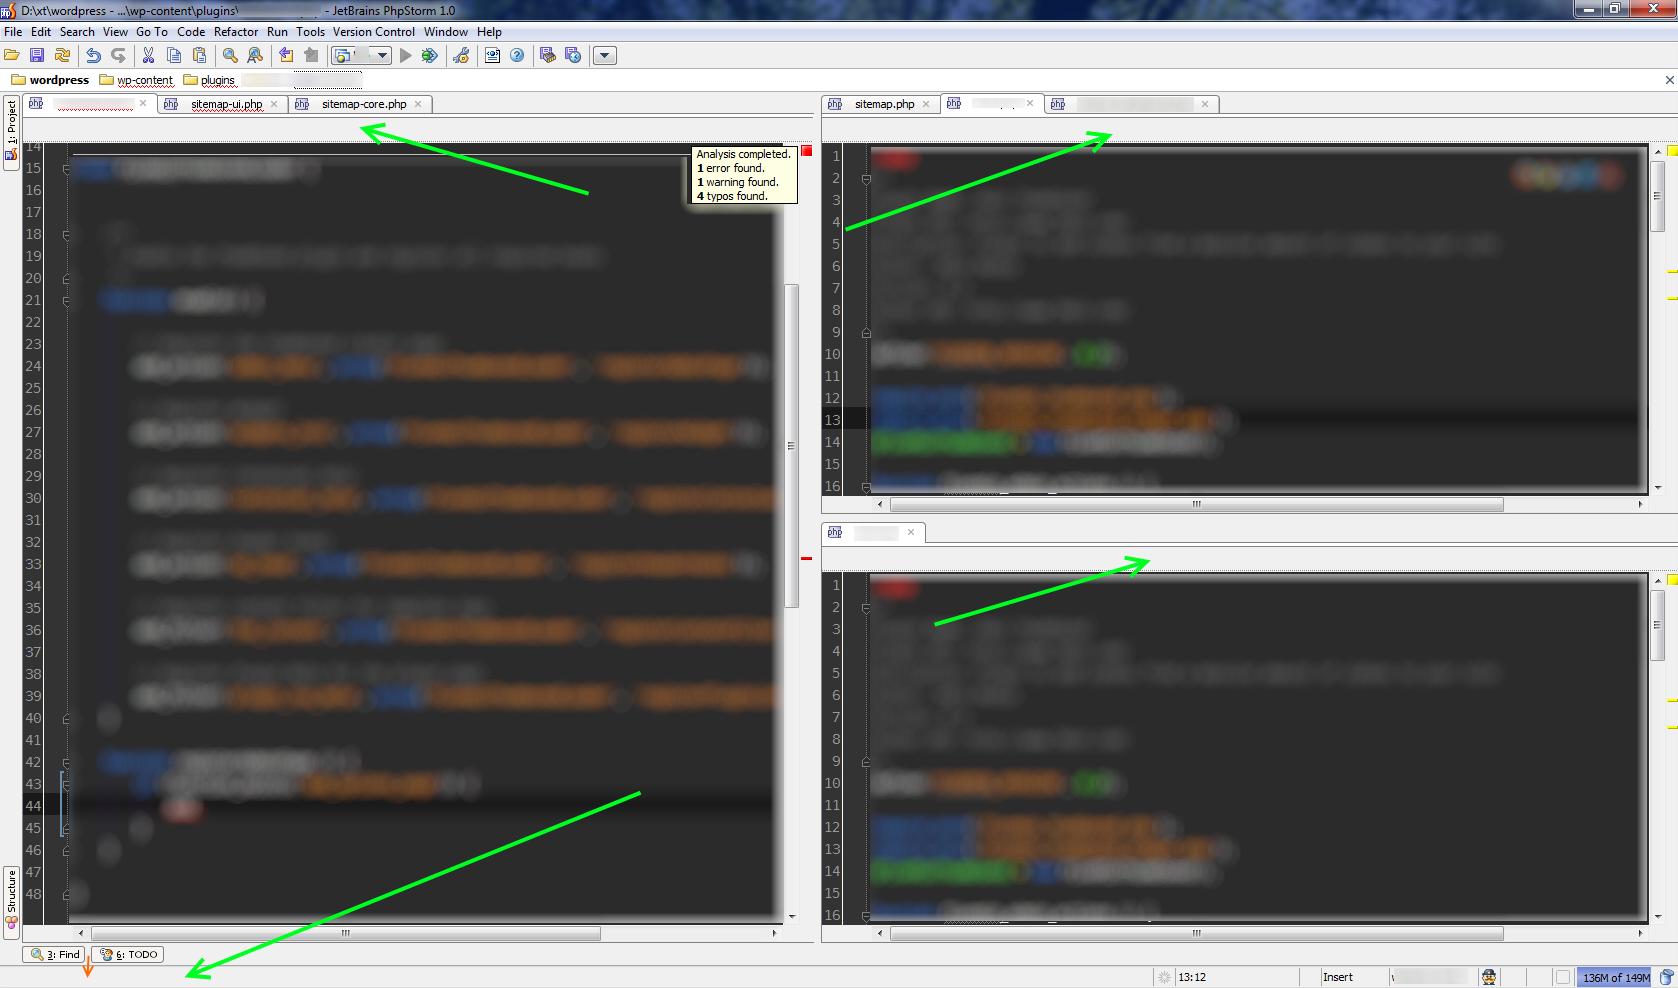 Dxtwordpress - ...wp-contentplugins5min5min.php - JetBrains PhpStorm 1.0.png